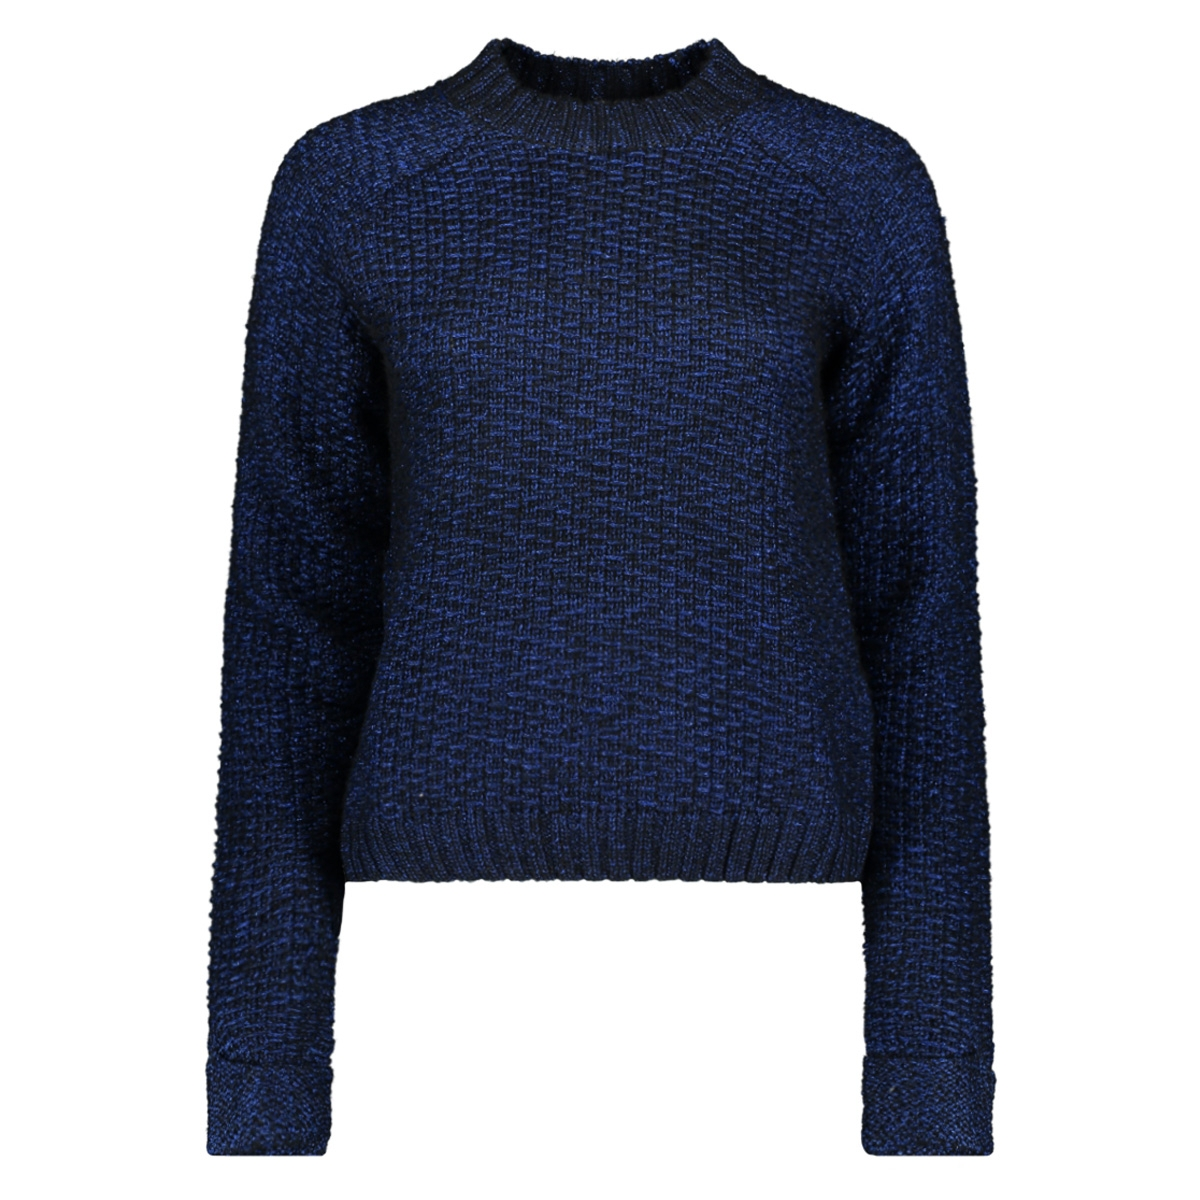 nmdaniel l/s mockneck knit 7 27004461 noisy may trui black/surf the web